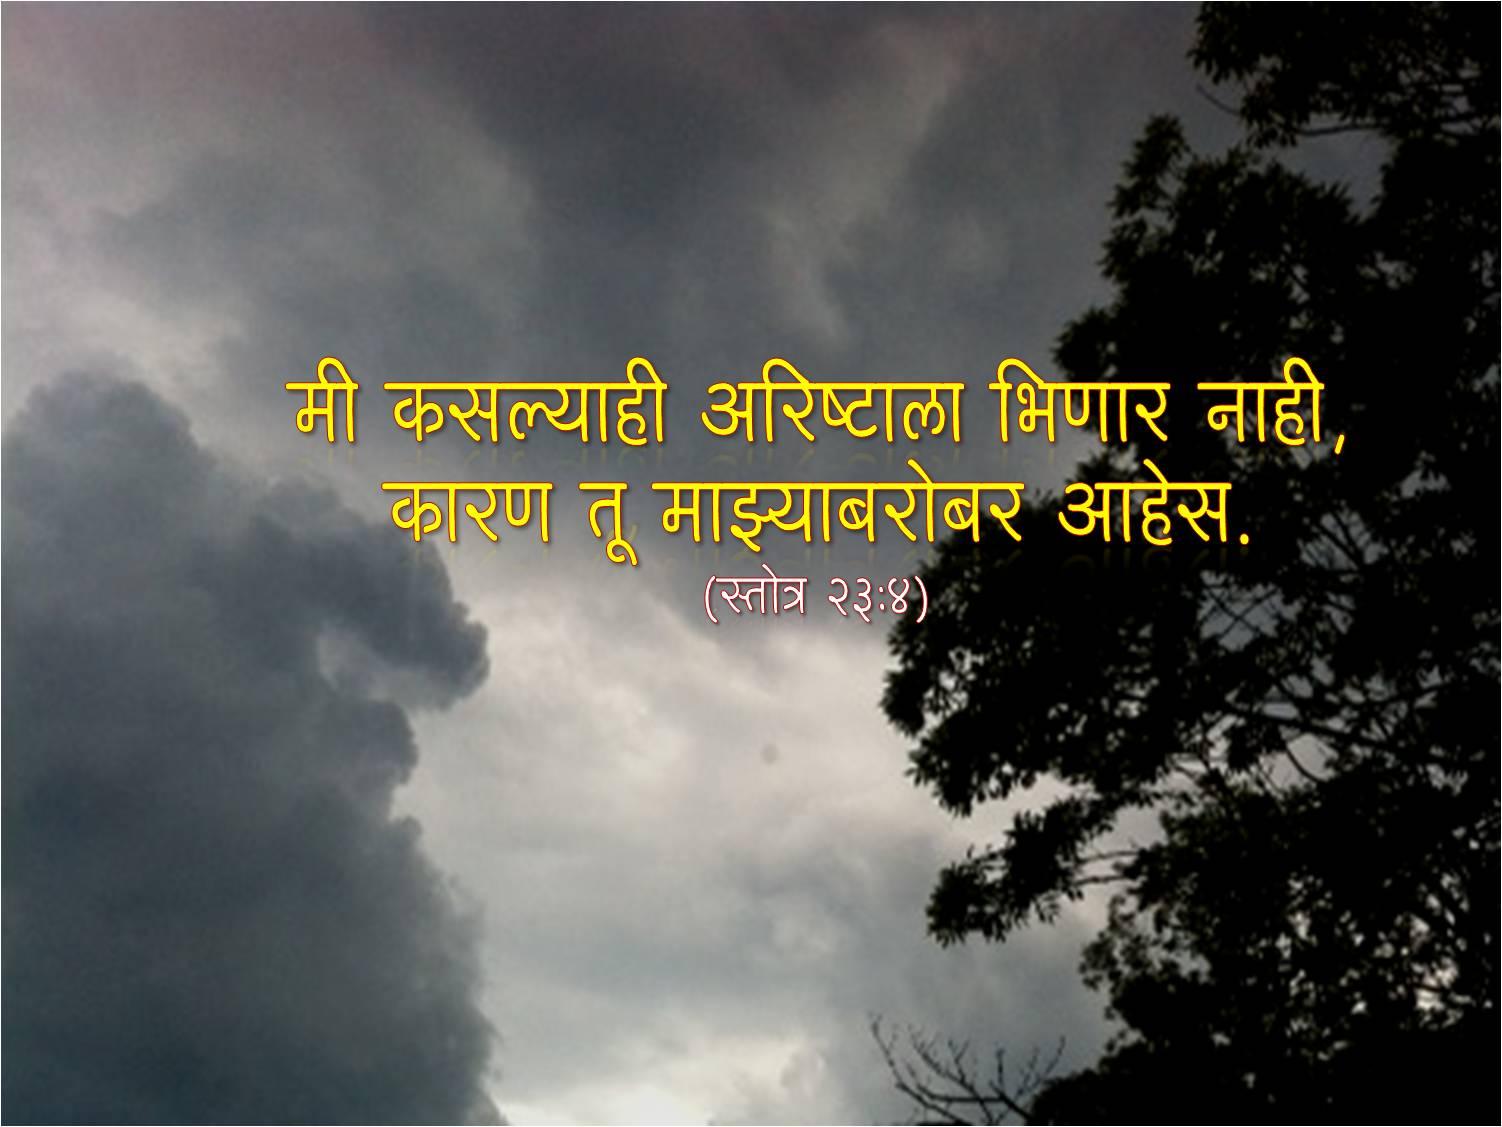 marathi bible wallpaper for - photo #9